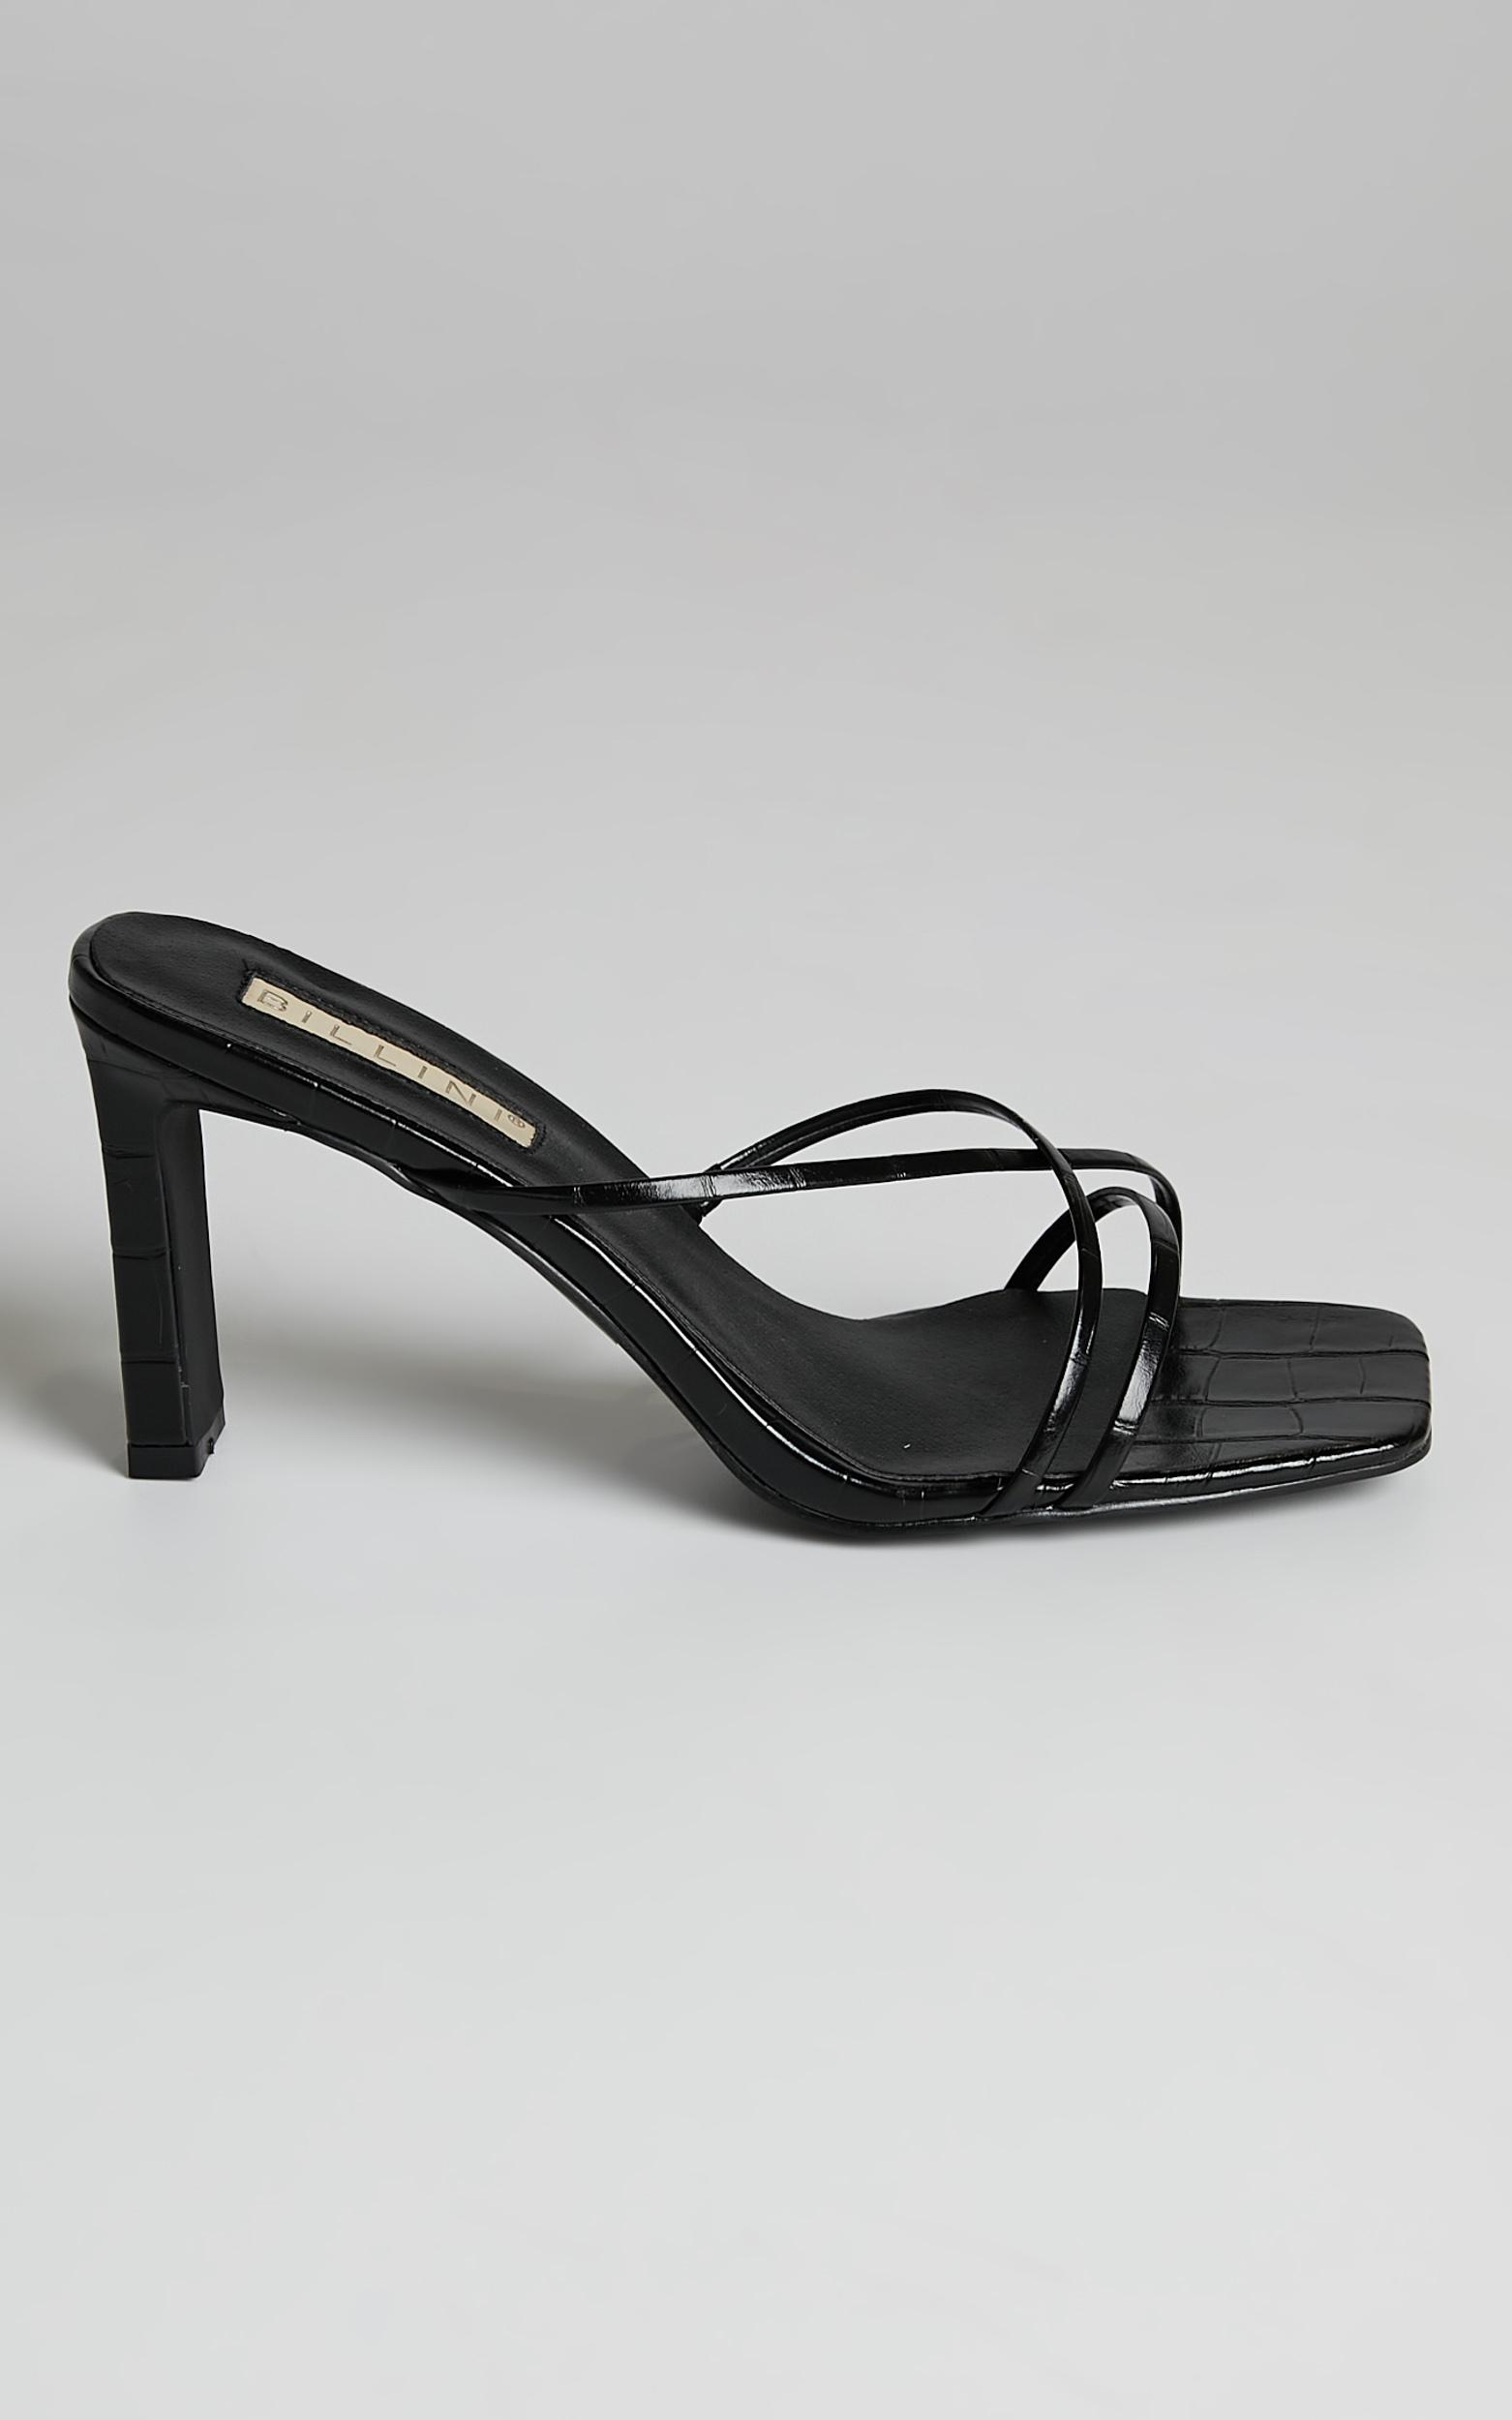 Billini - Oakly Heels in Black Croc - 05, BLK1, hi-res image number null